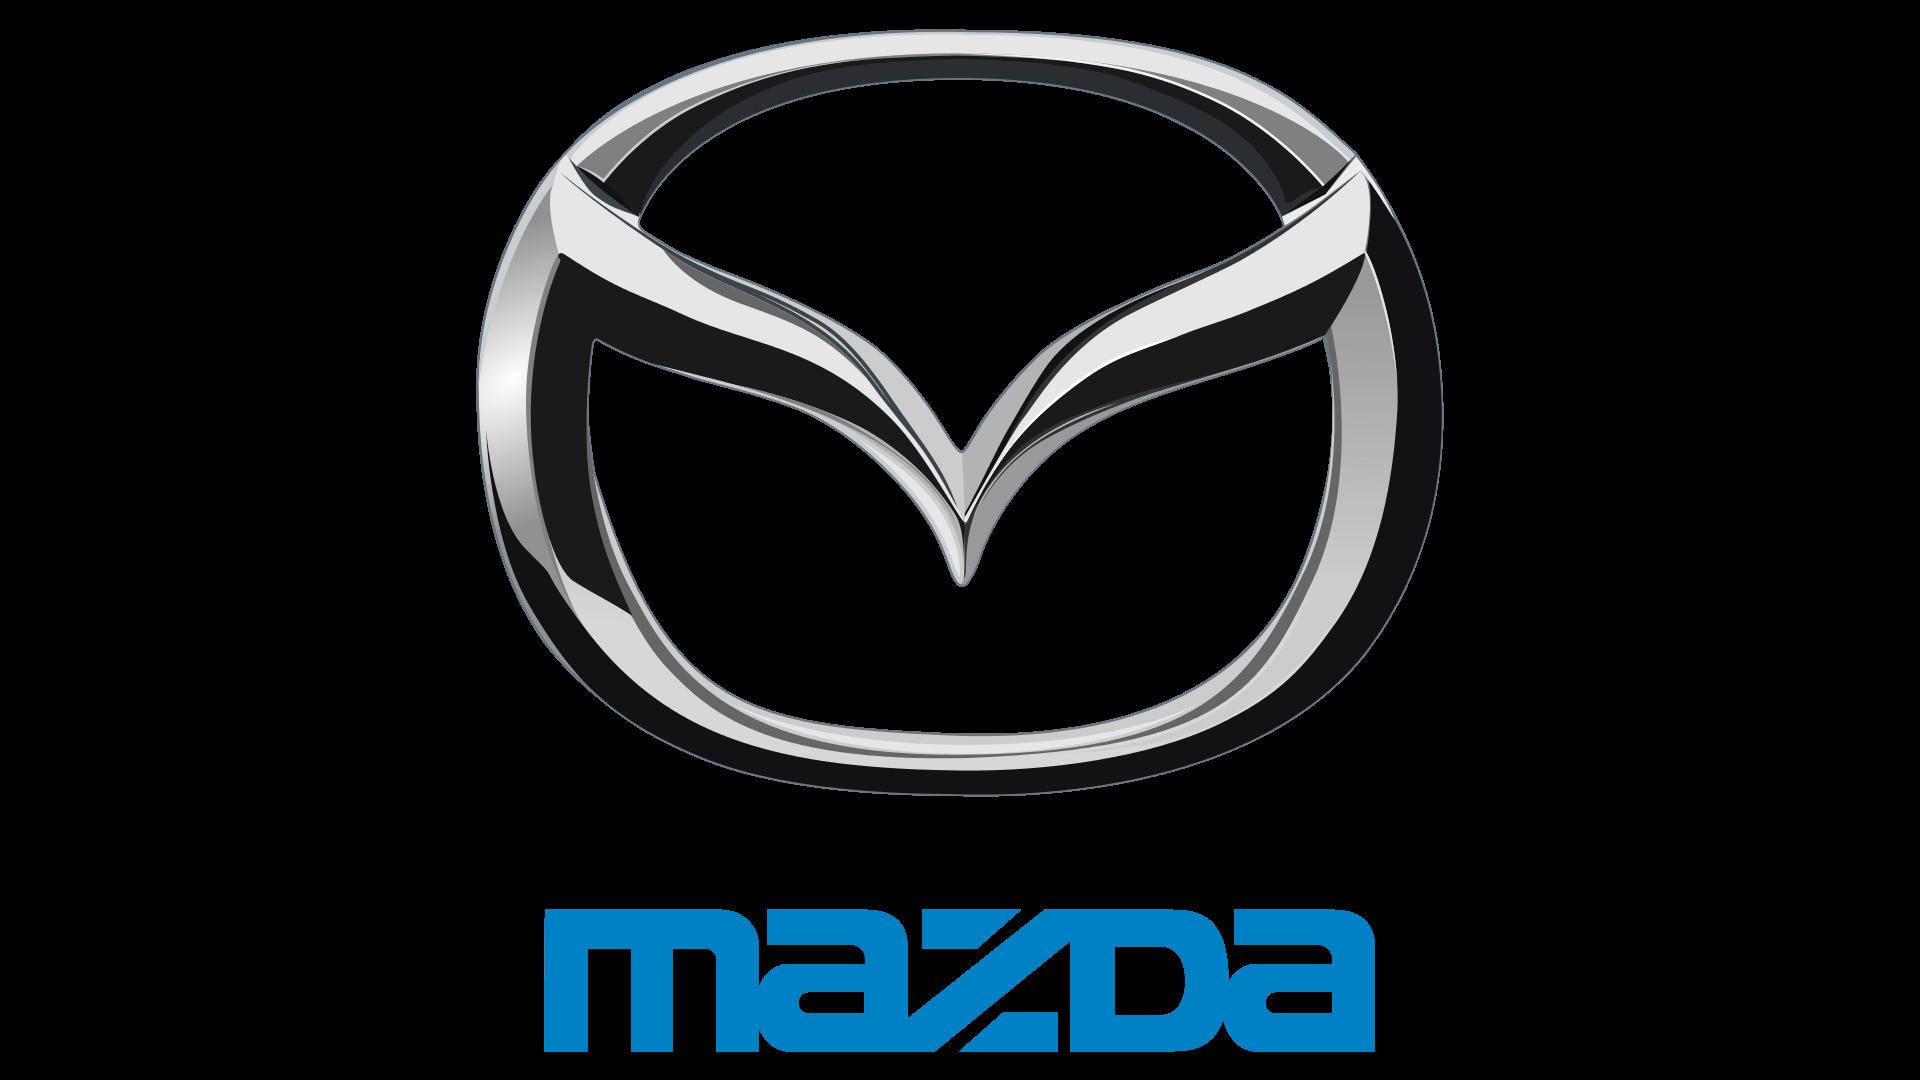 Car Logo Mazda - Car, Transparent background PNG HD thumbnail